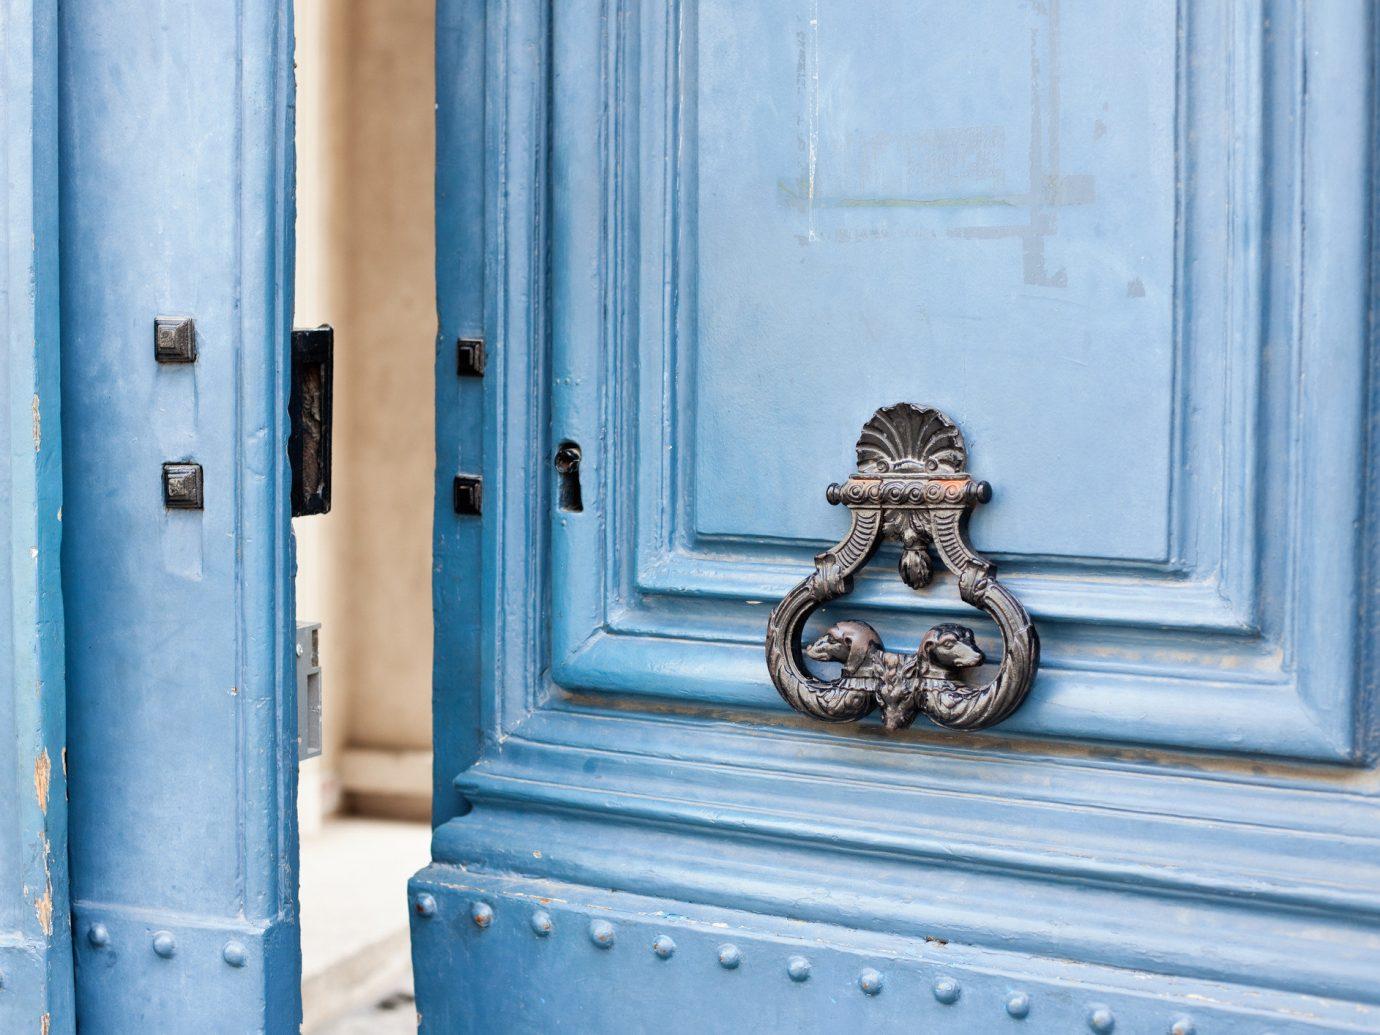 Offbeat color blue outdoor white building house wall window wood door